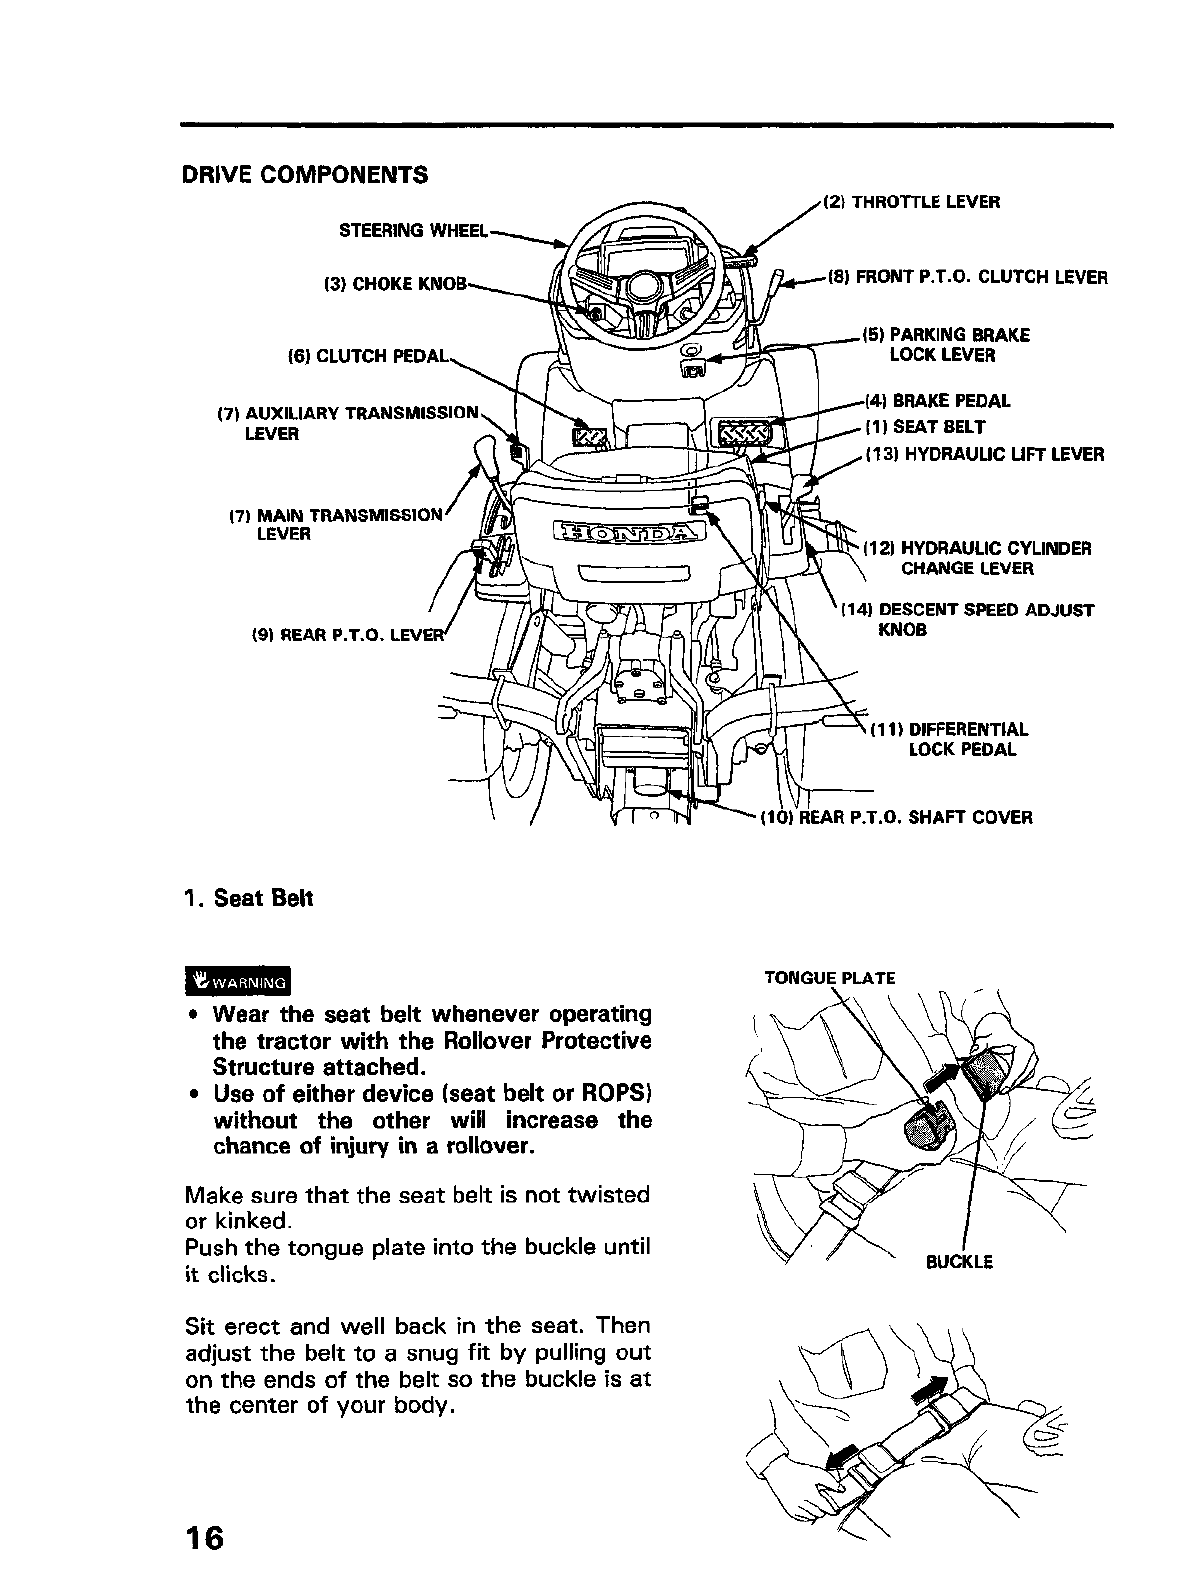 Honda Rt5000 Owners Manual